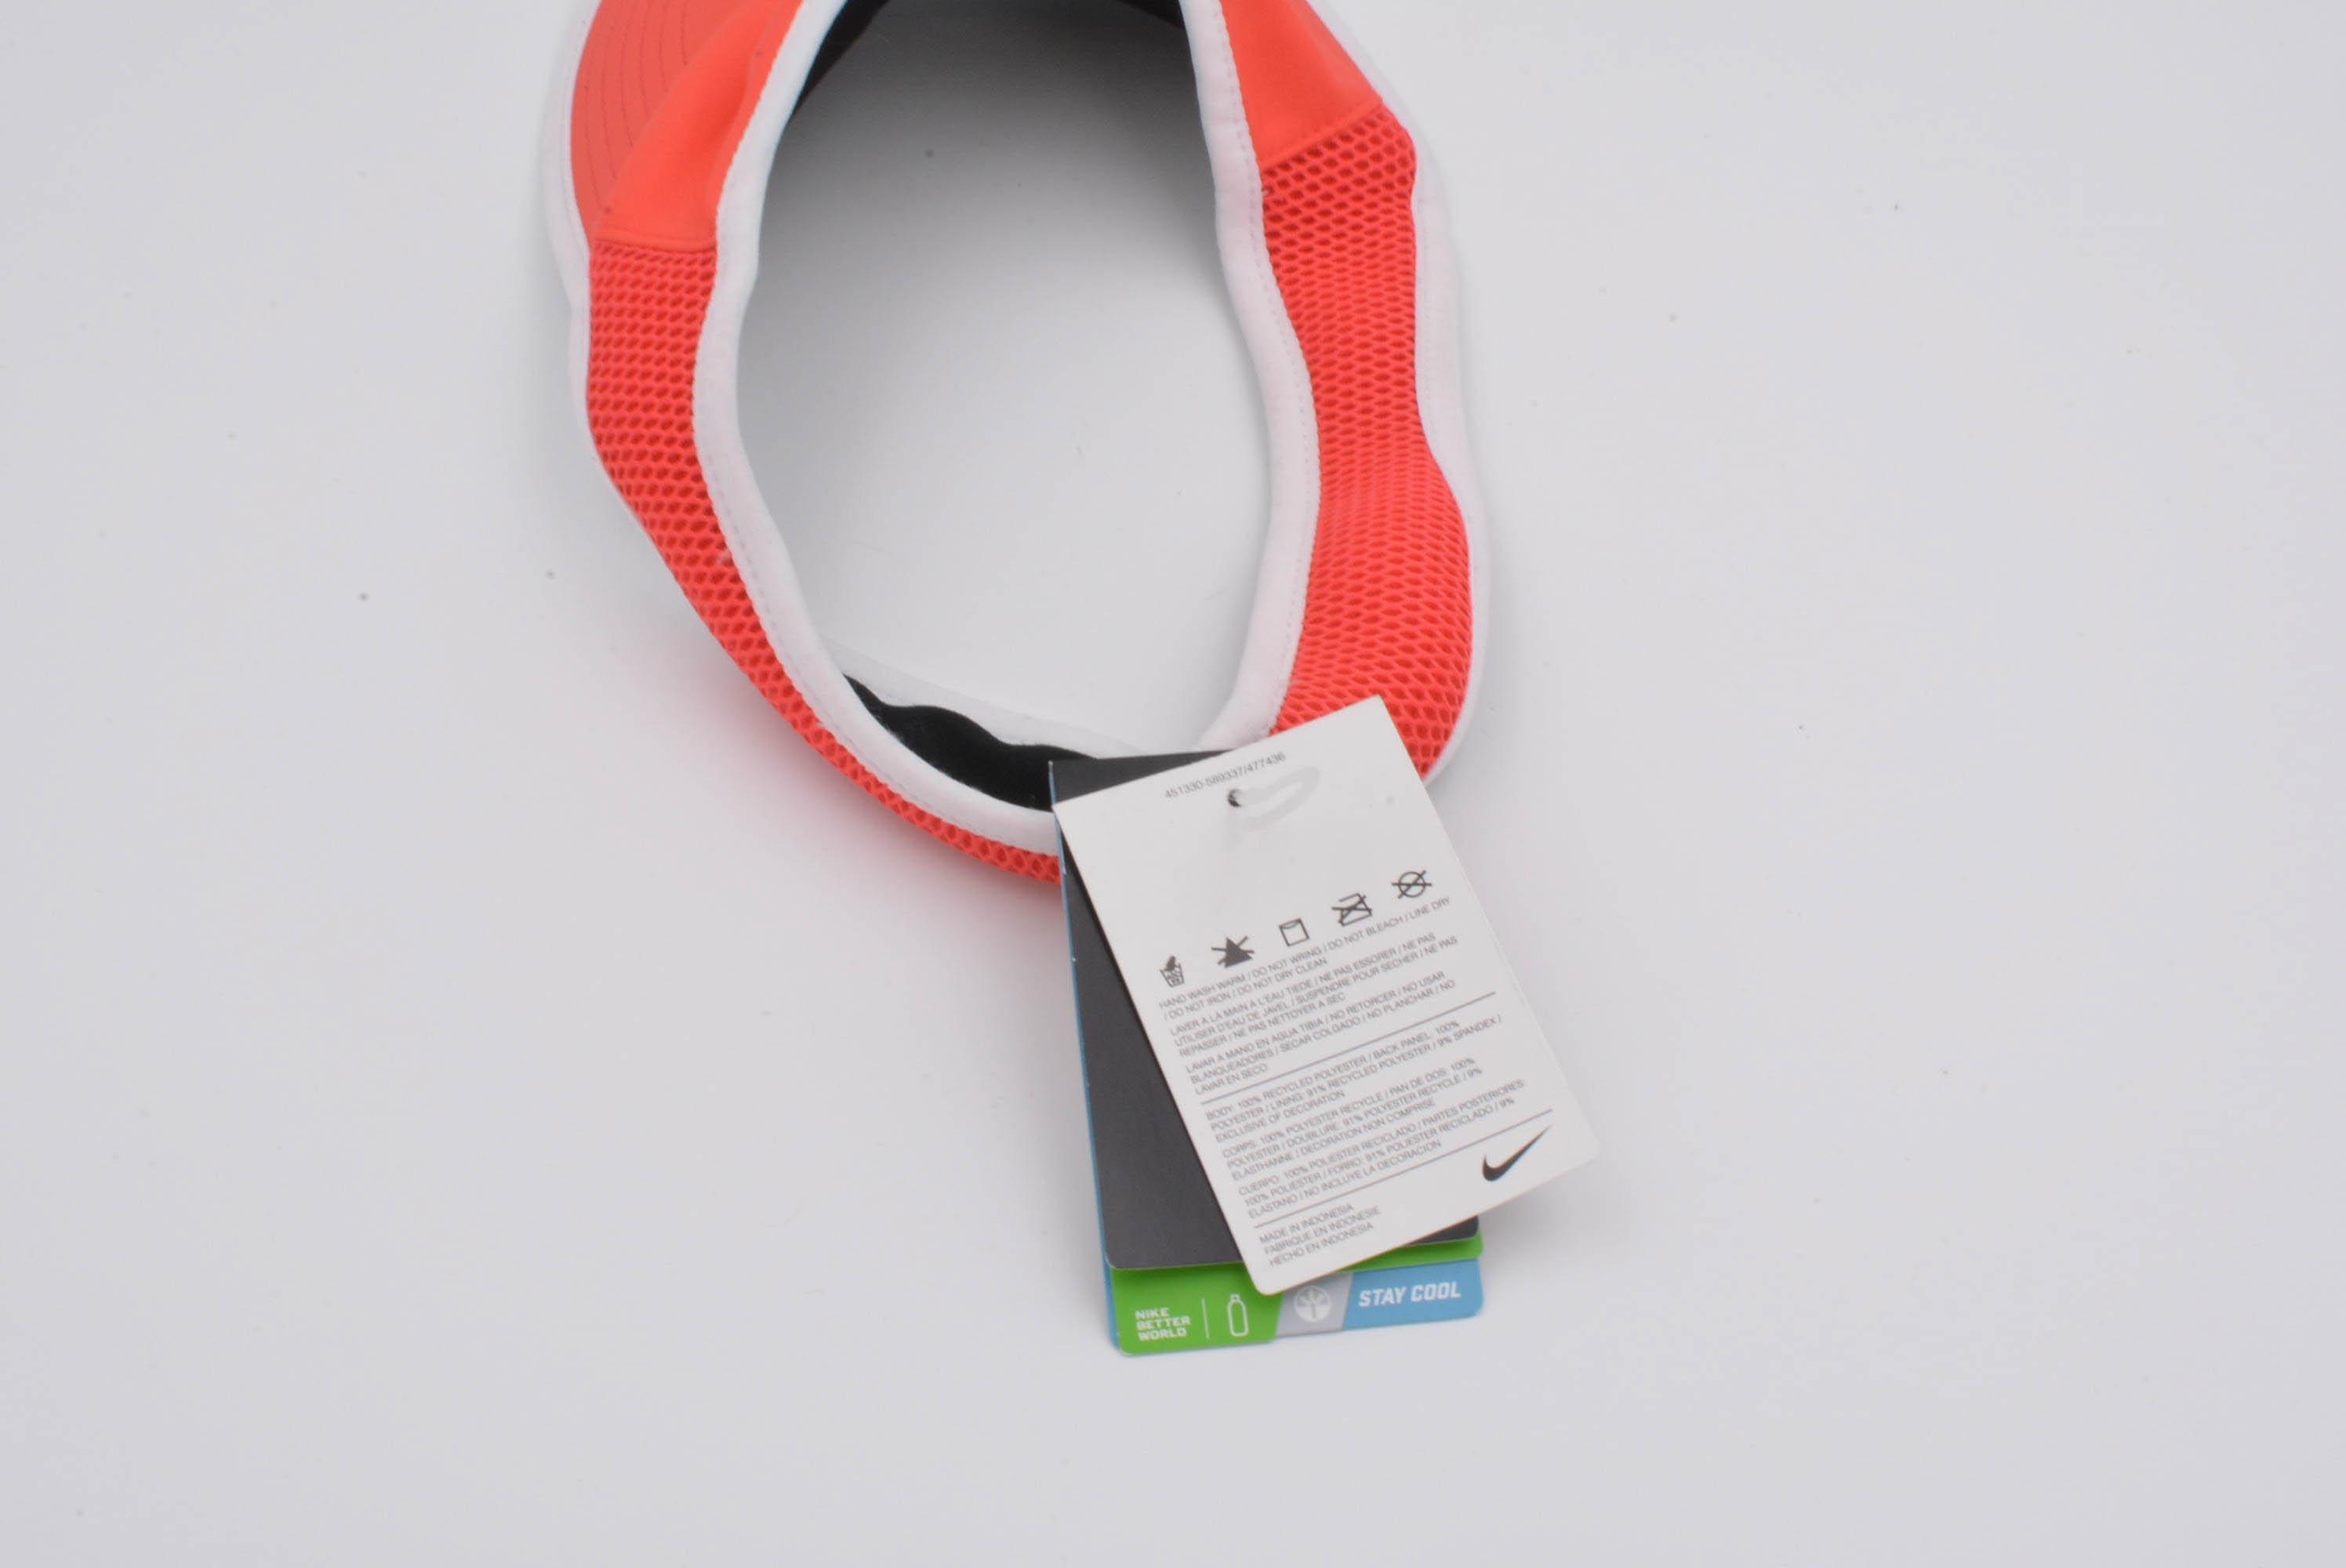 Nike-FEATHERLITE-DRI-FIT-TENNIS-VISOR-HAT-WOMENS-Size-S-M thumbnail 5